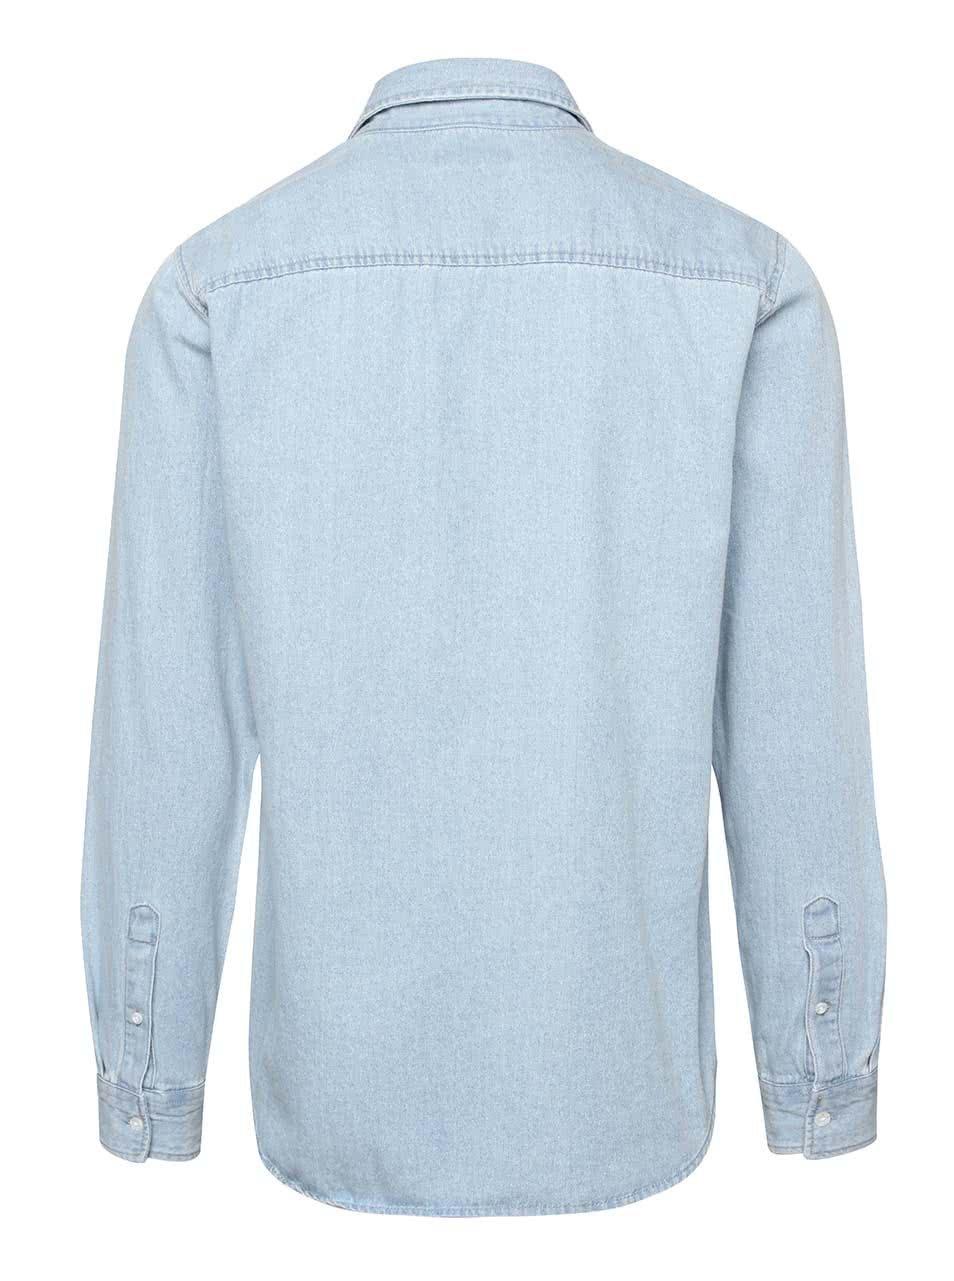 d63323deda Svetlomodrá rifľová košeľa s vreckom Jack   Jones Denim ...